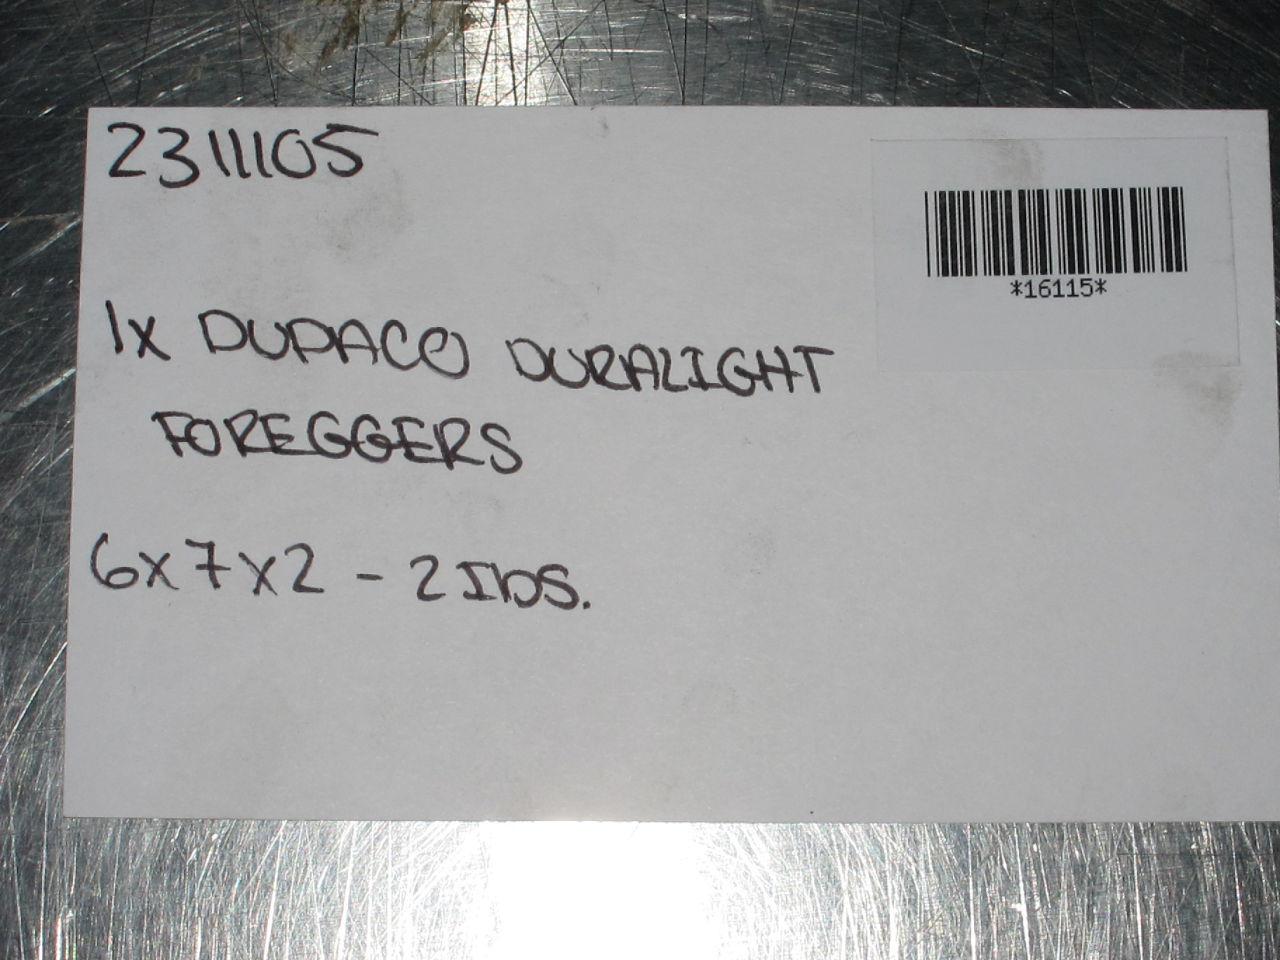 DUPACO Duralight Foreggers